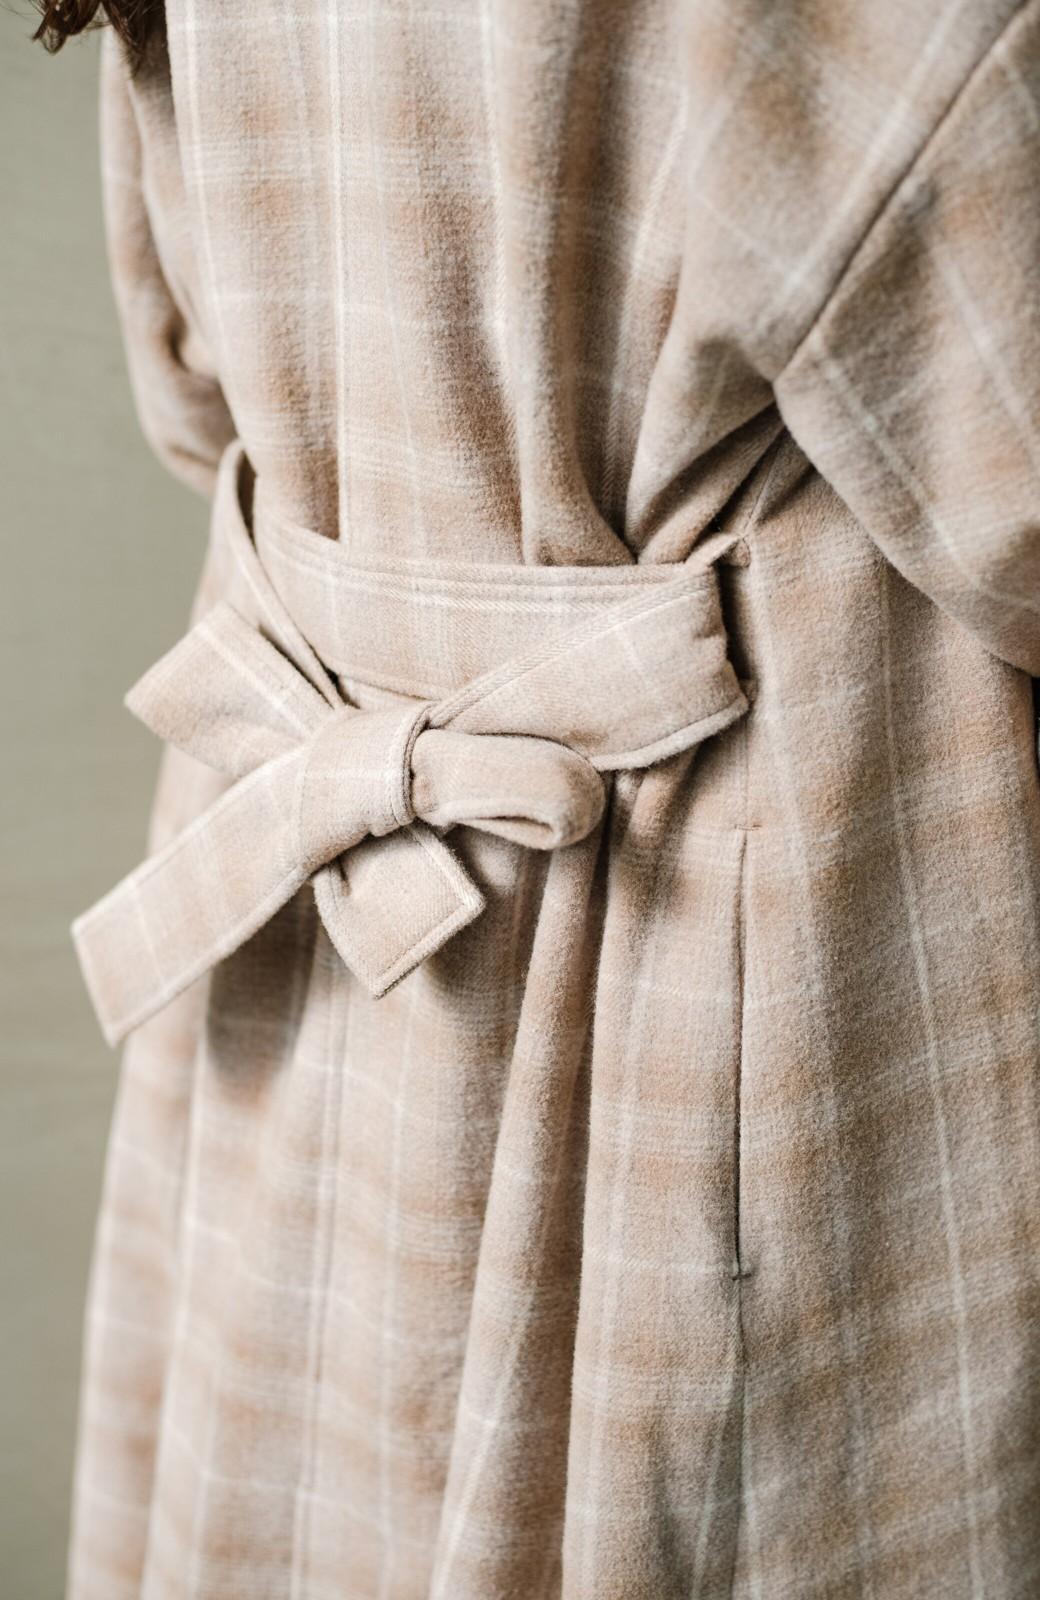 haco! パッと羽織るだけで様になる!カジュアルにも大人っぽくも着られる便利なチェックコート <ベージュ系その他>の商品写真8